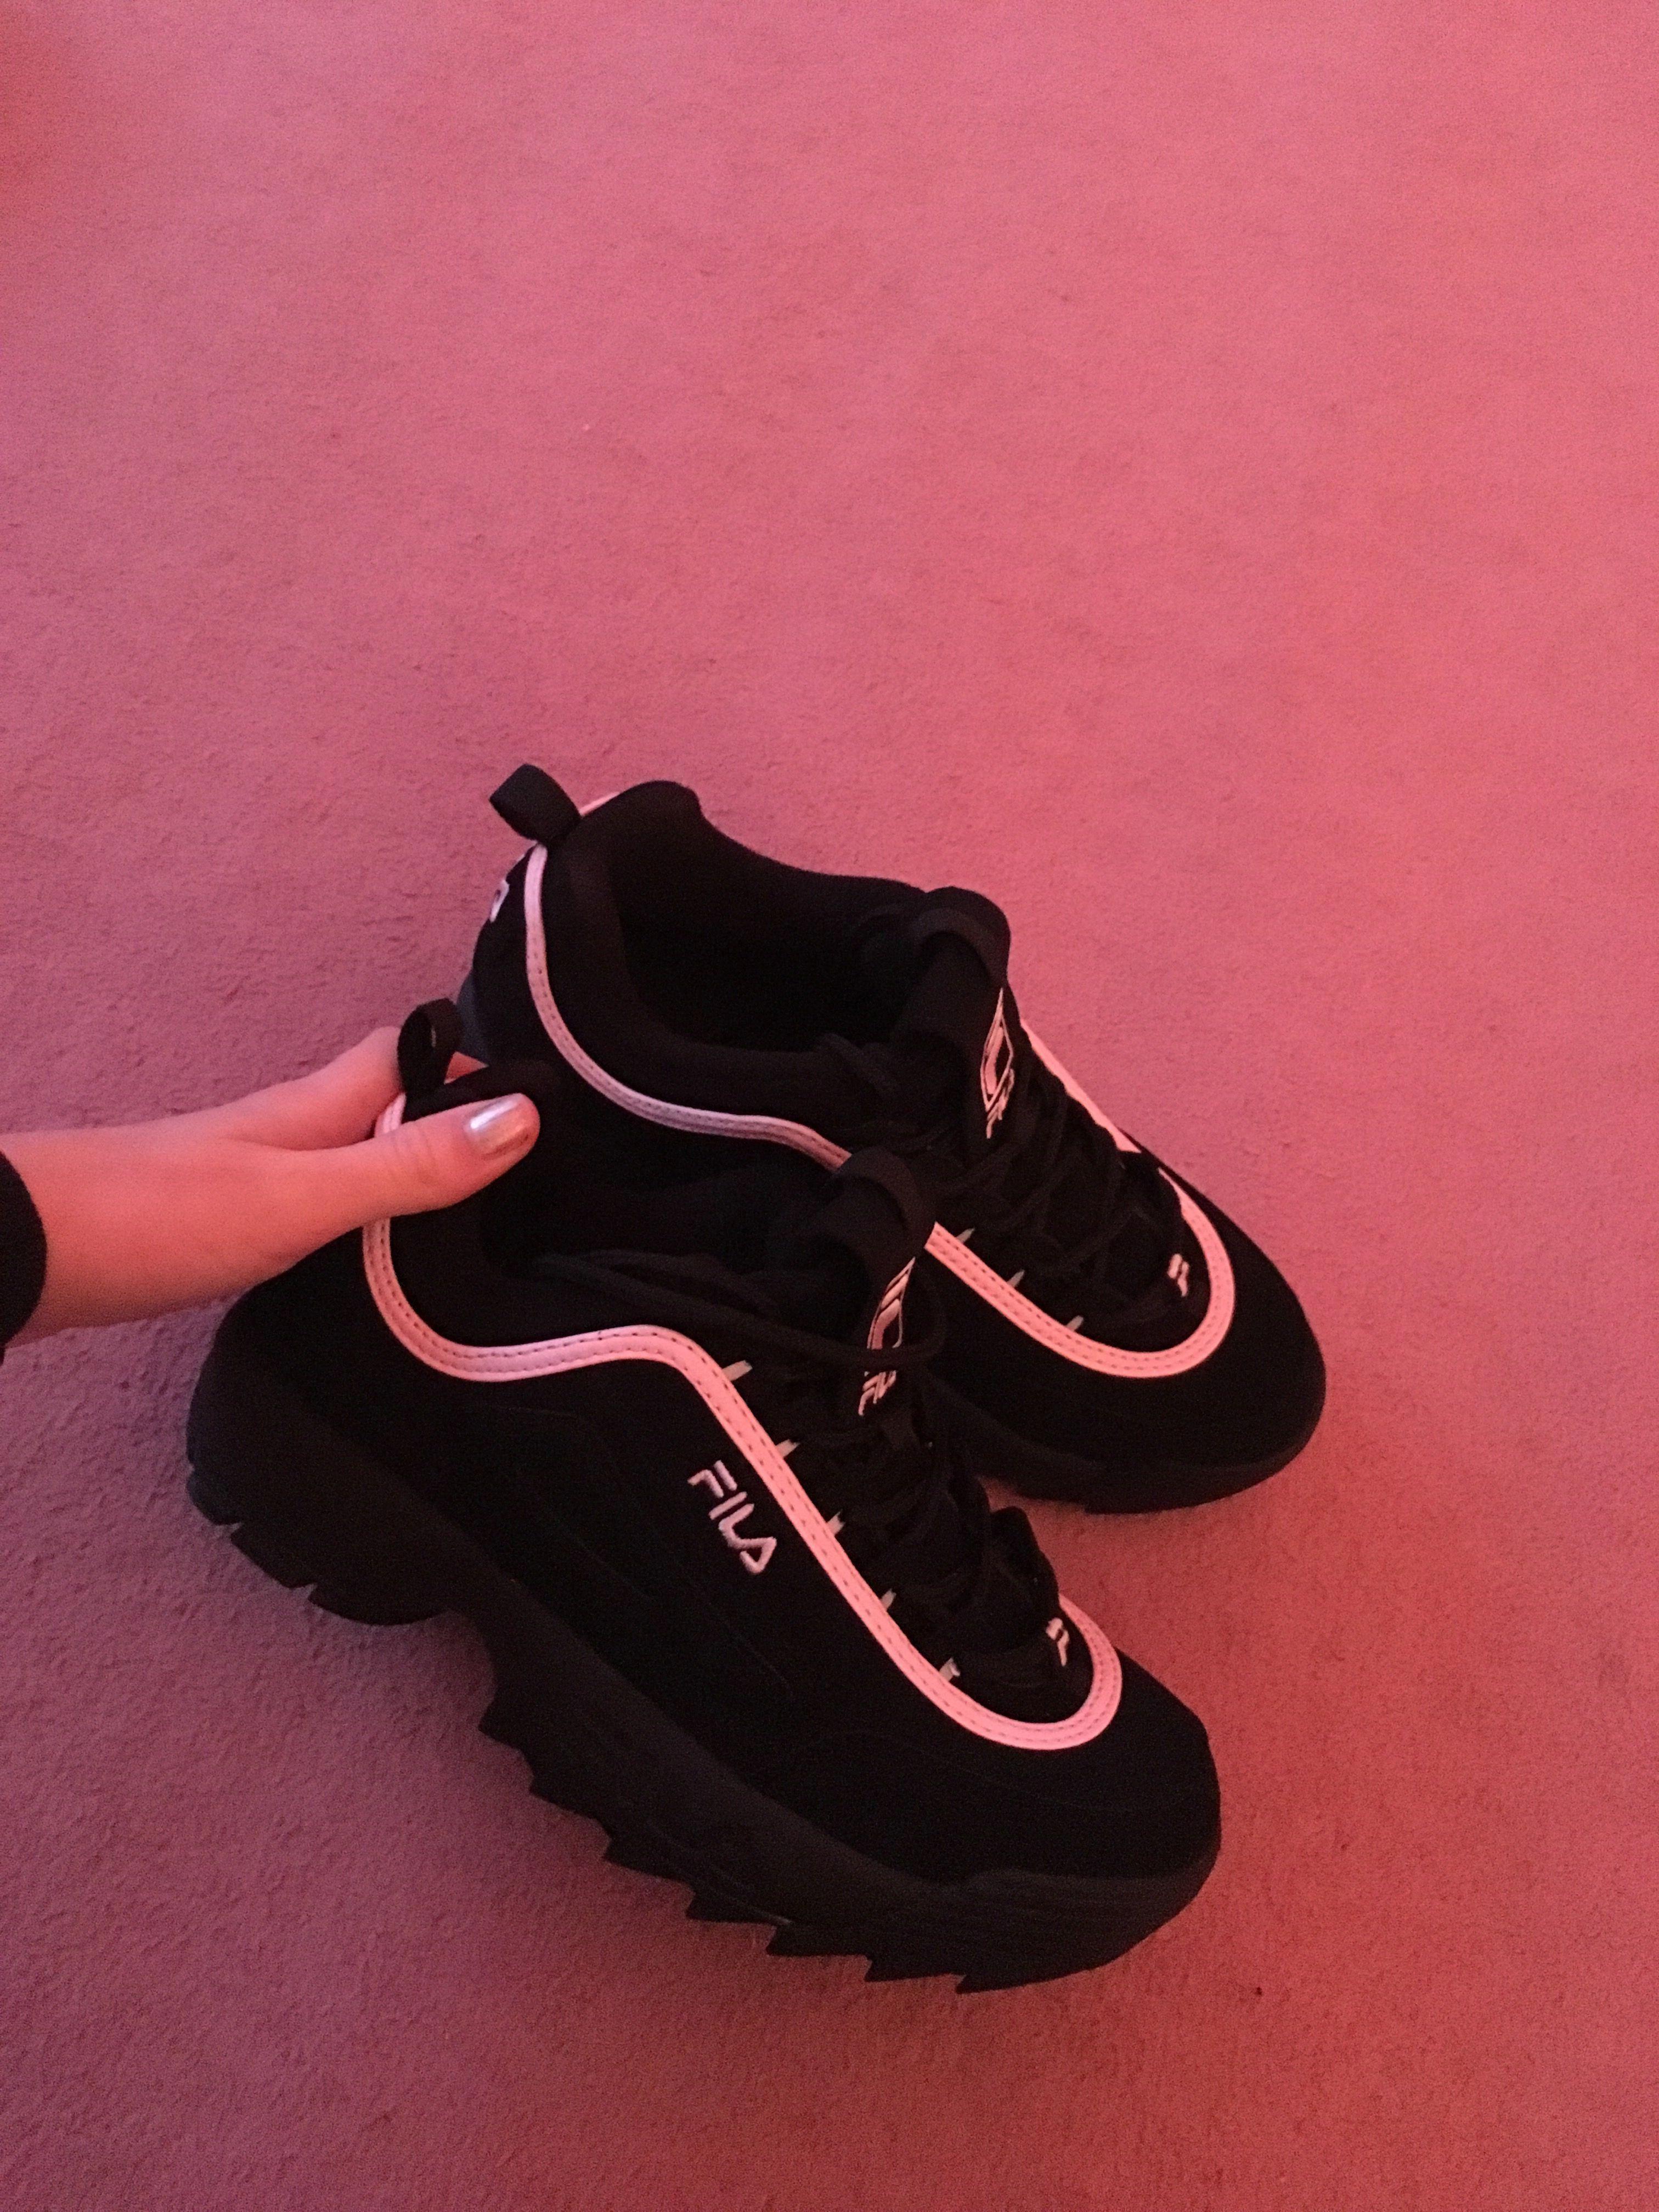 Zappos Women S Luxury Shoes Ynotwomensshoes Id 6225415851 Di 2020